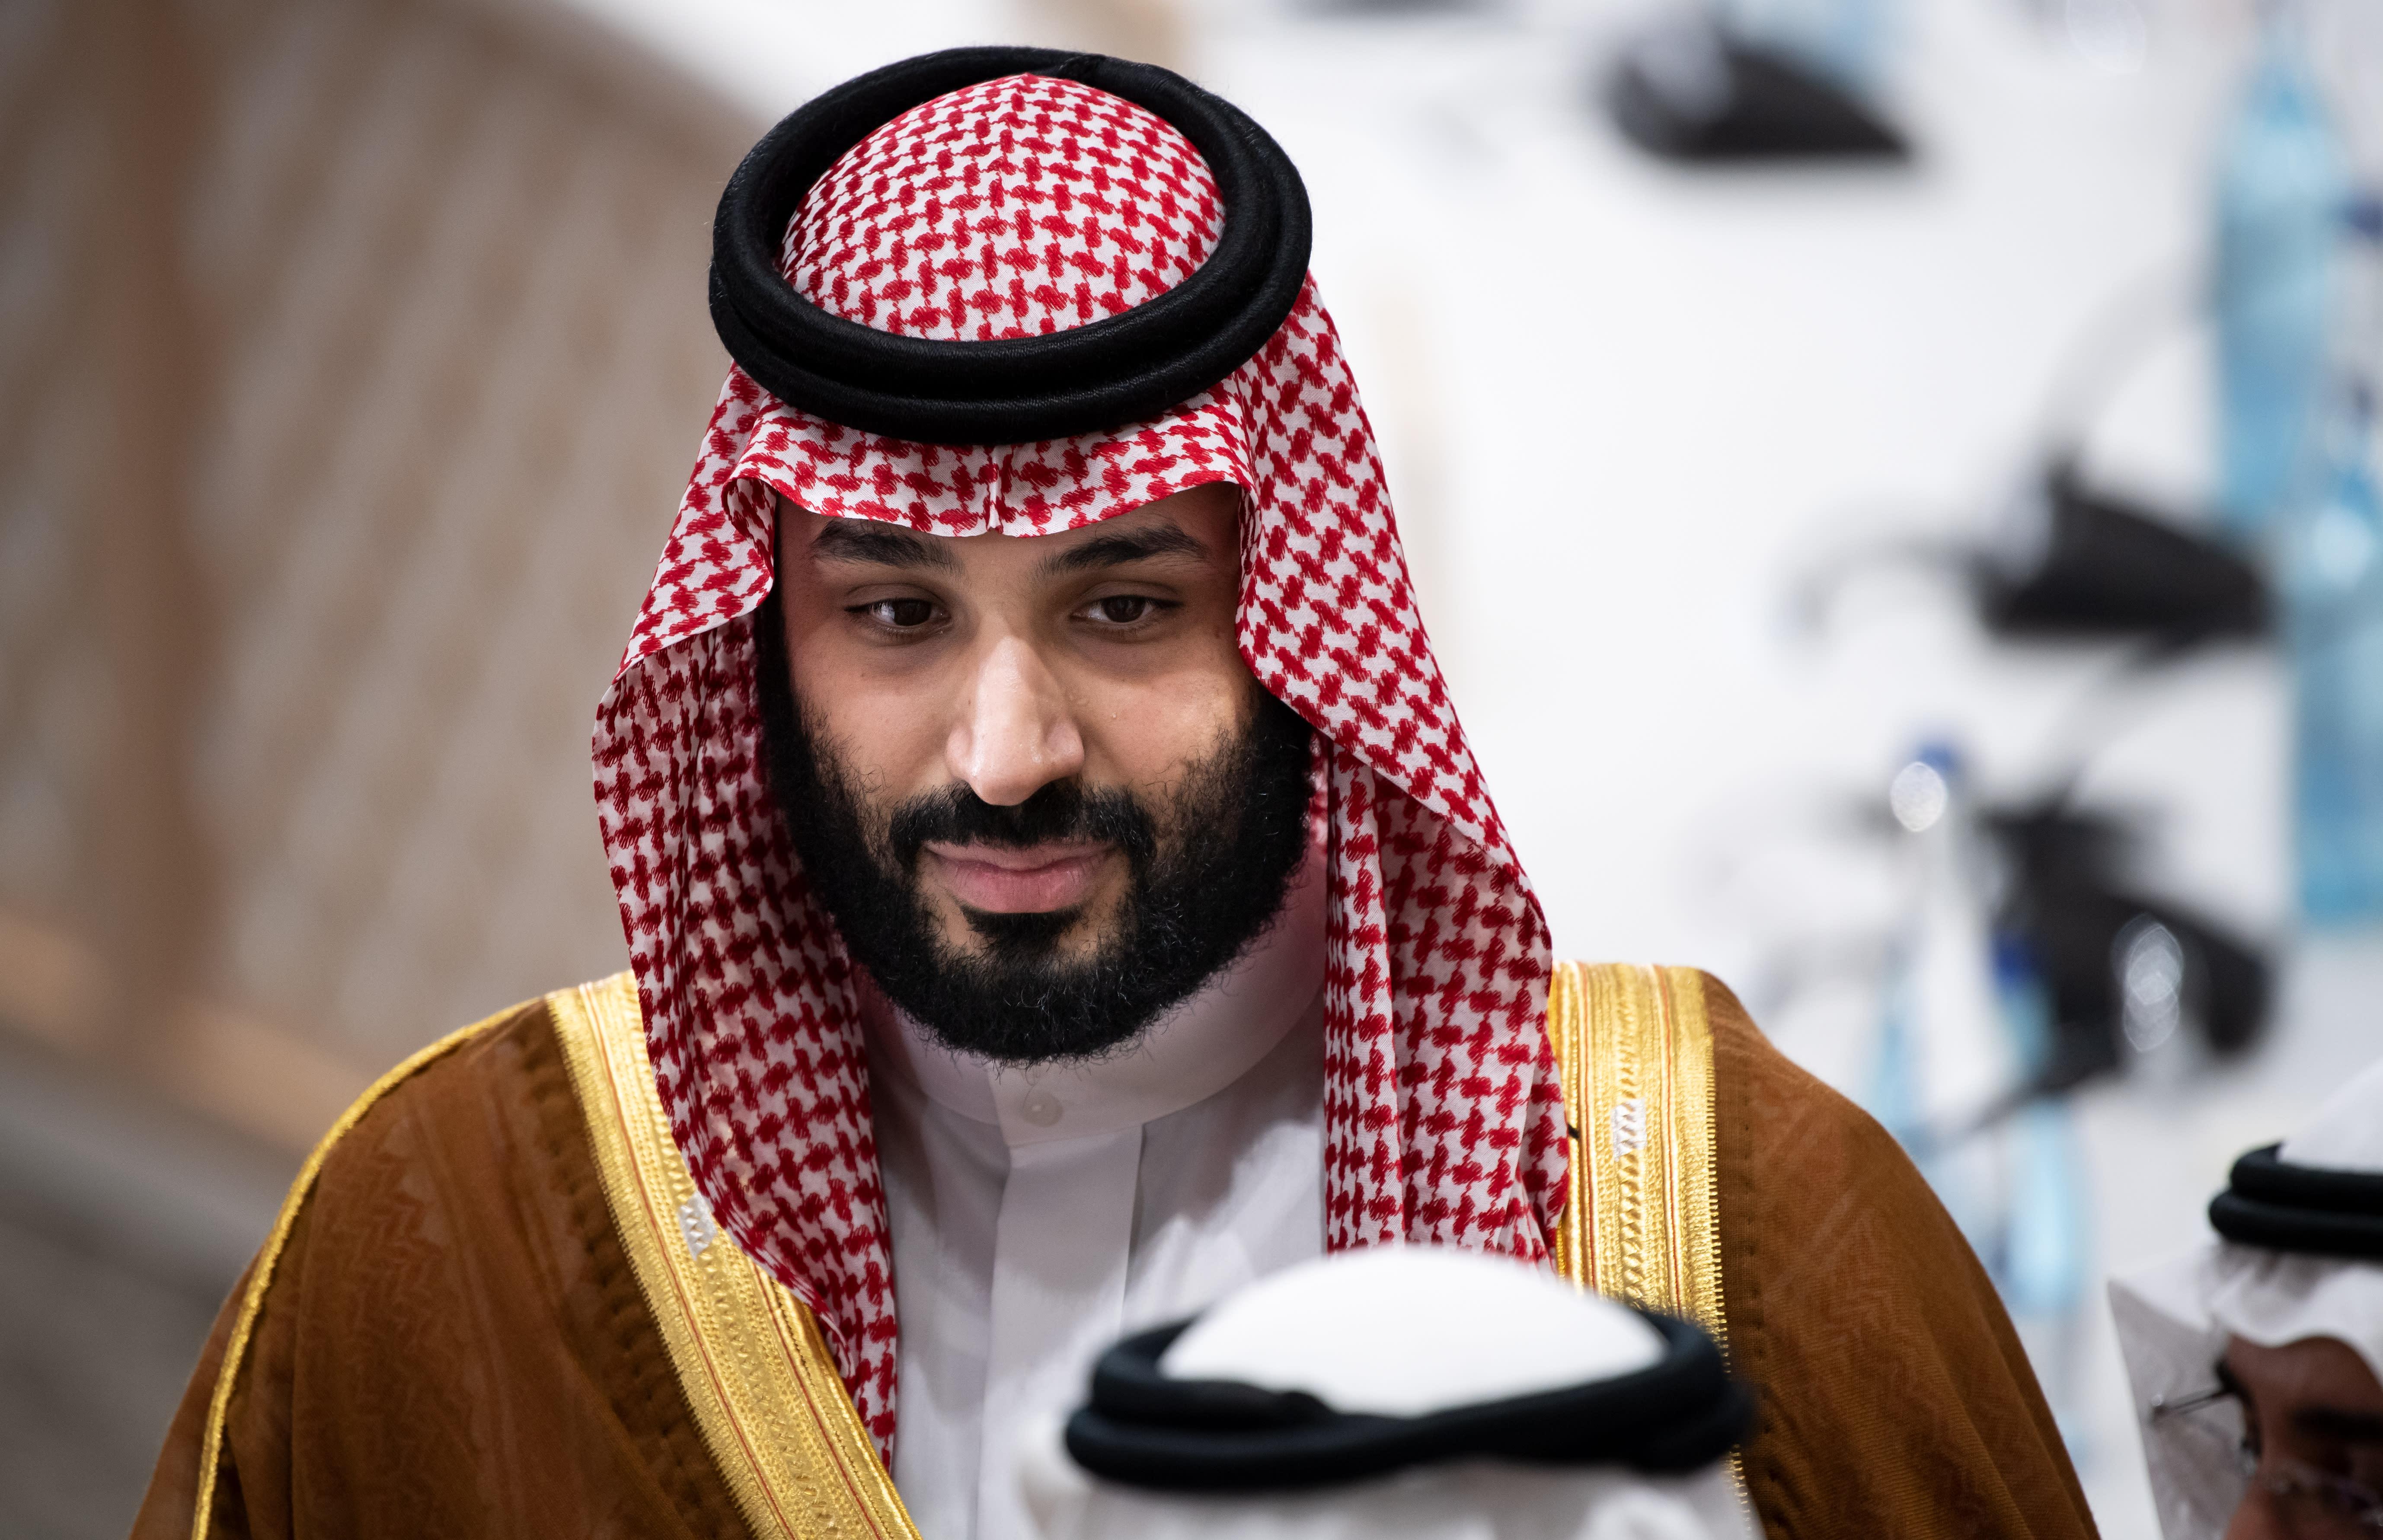 United Nations: Saudi Arabia 'possibly involved' in Jeff Bezos phone hack